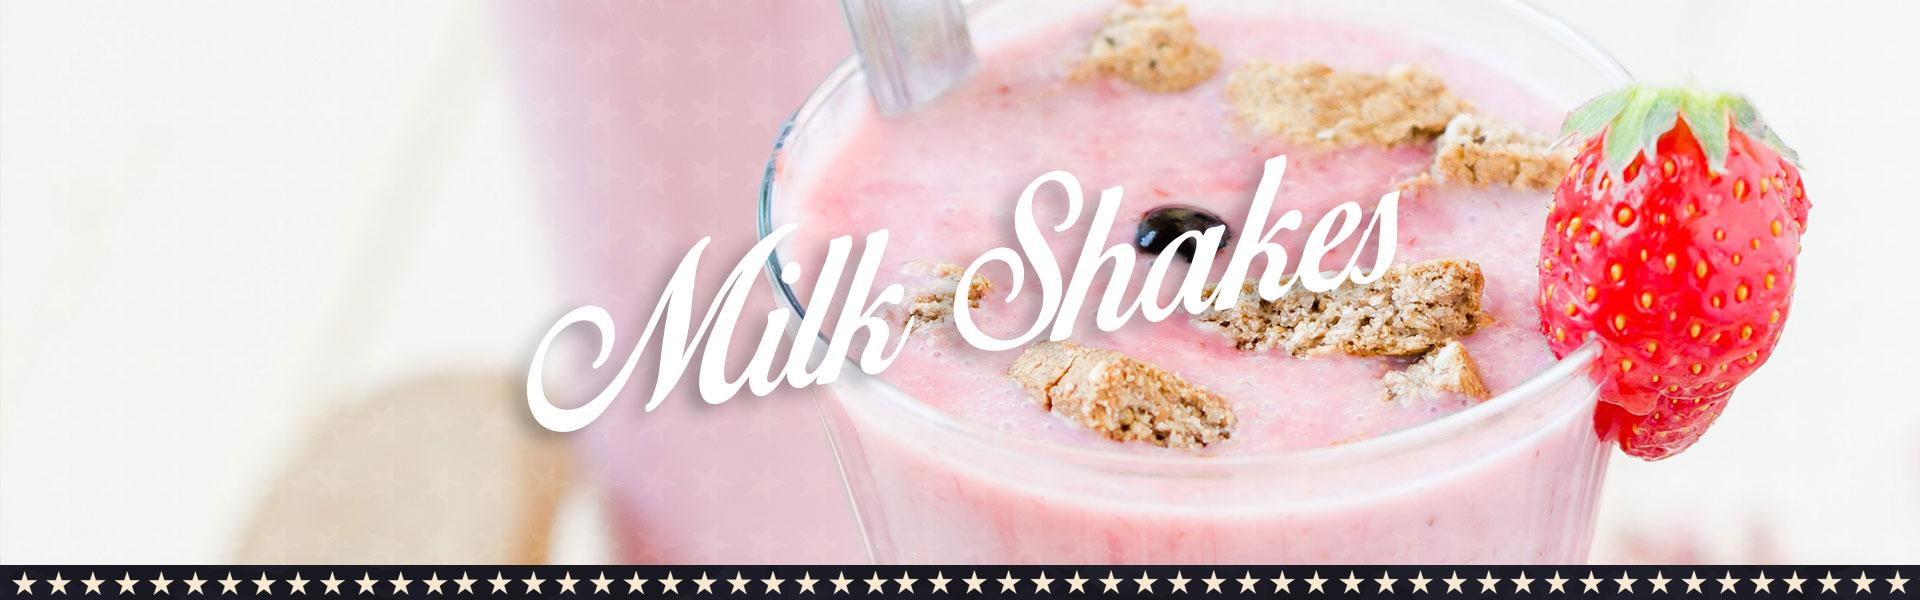 milkshakes_header